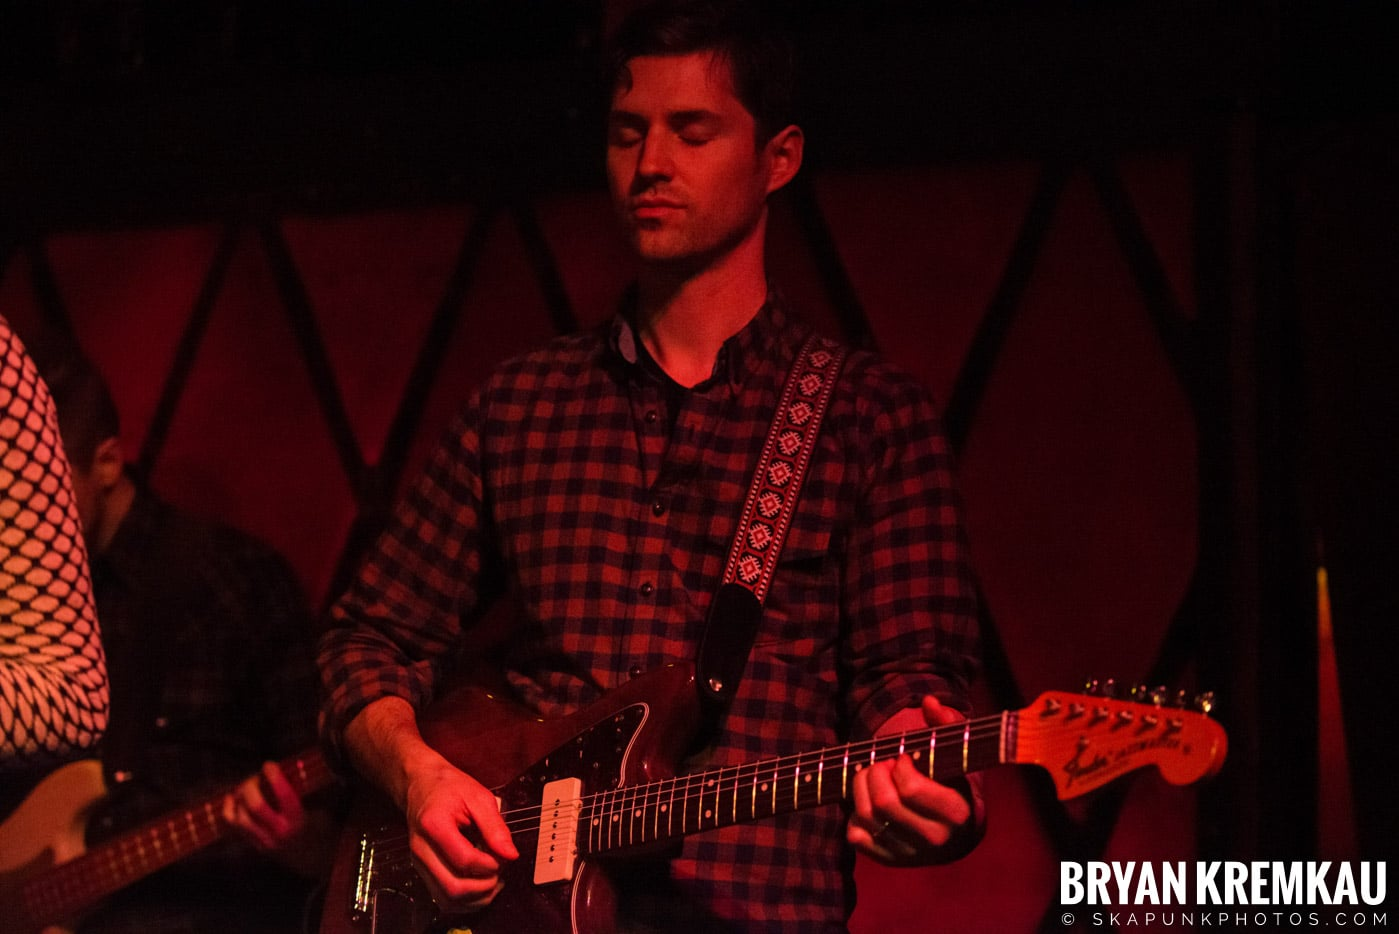 Peter Bradley Adams @ Rockwood Music Hall, NYC - 3.9.13 (22)